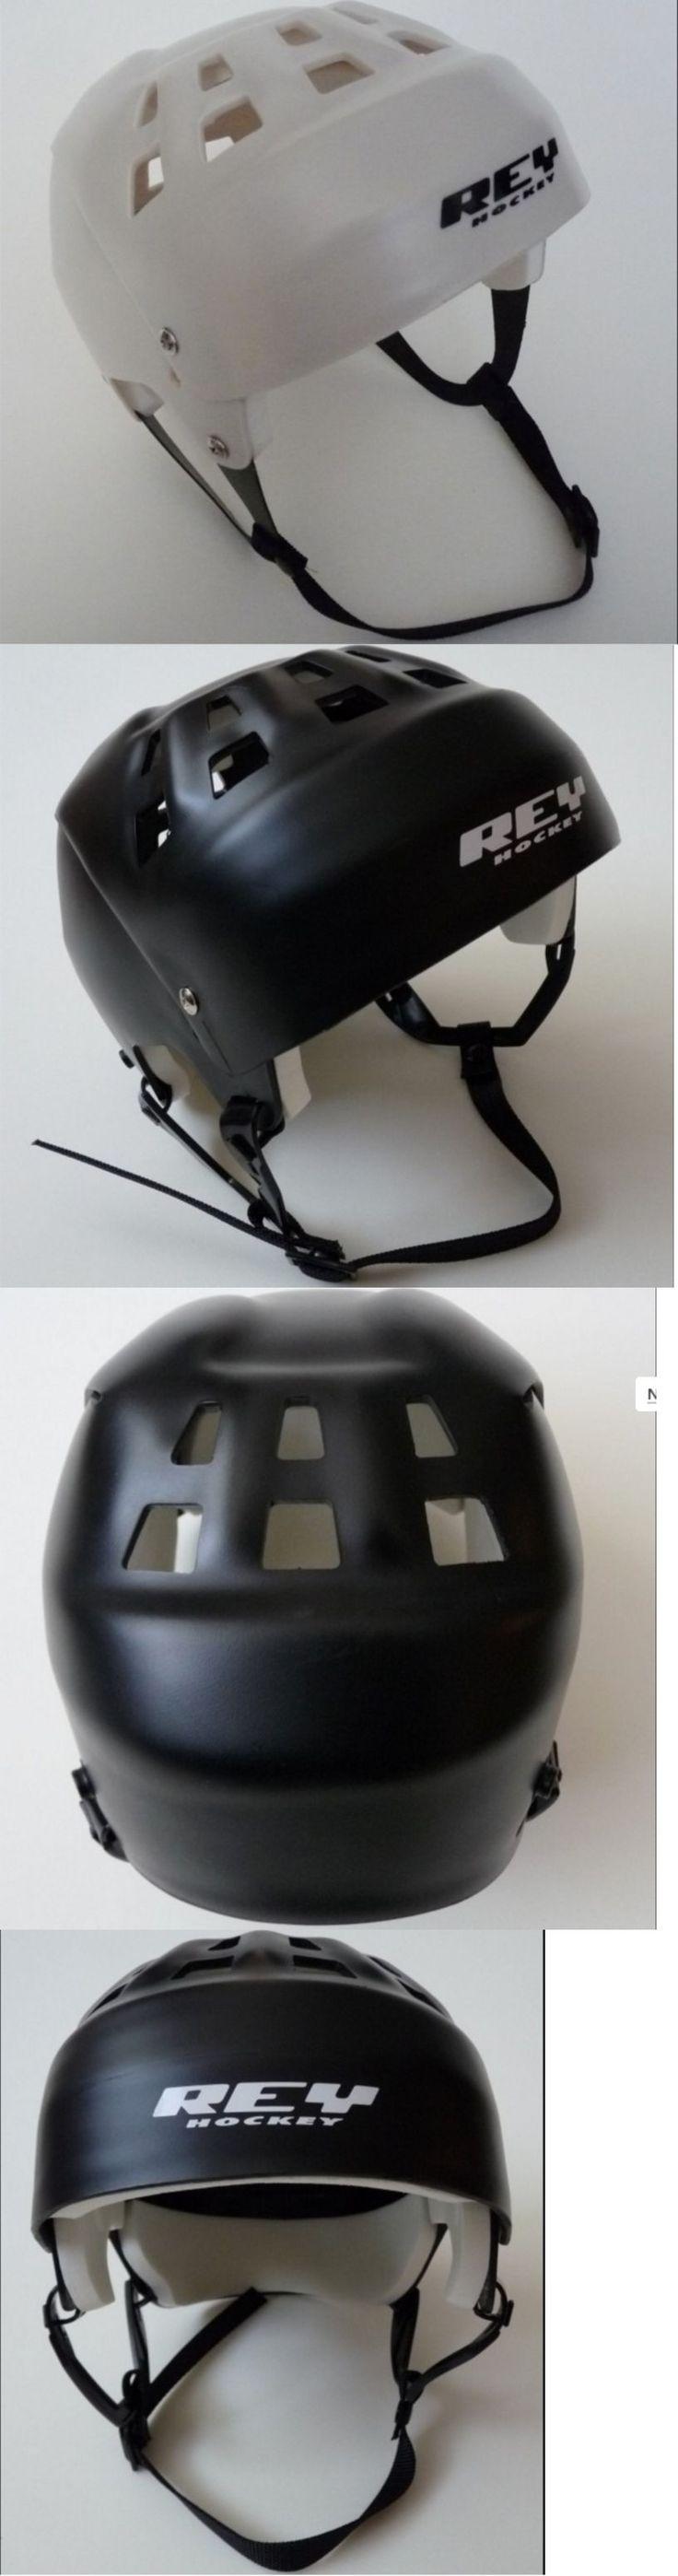 Helmets 20854: Rey Jofa-Style Street Hockey Helmet - Senior Sz White (Med/Large) Adjustable BUY IT NOW ONLY: $69.99